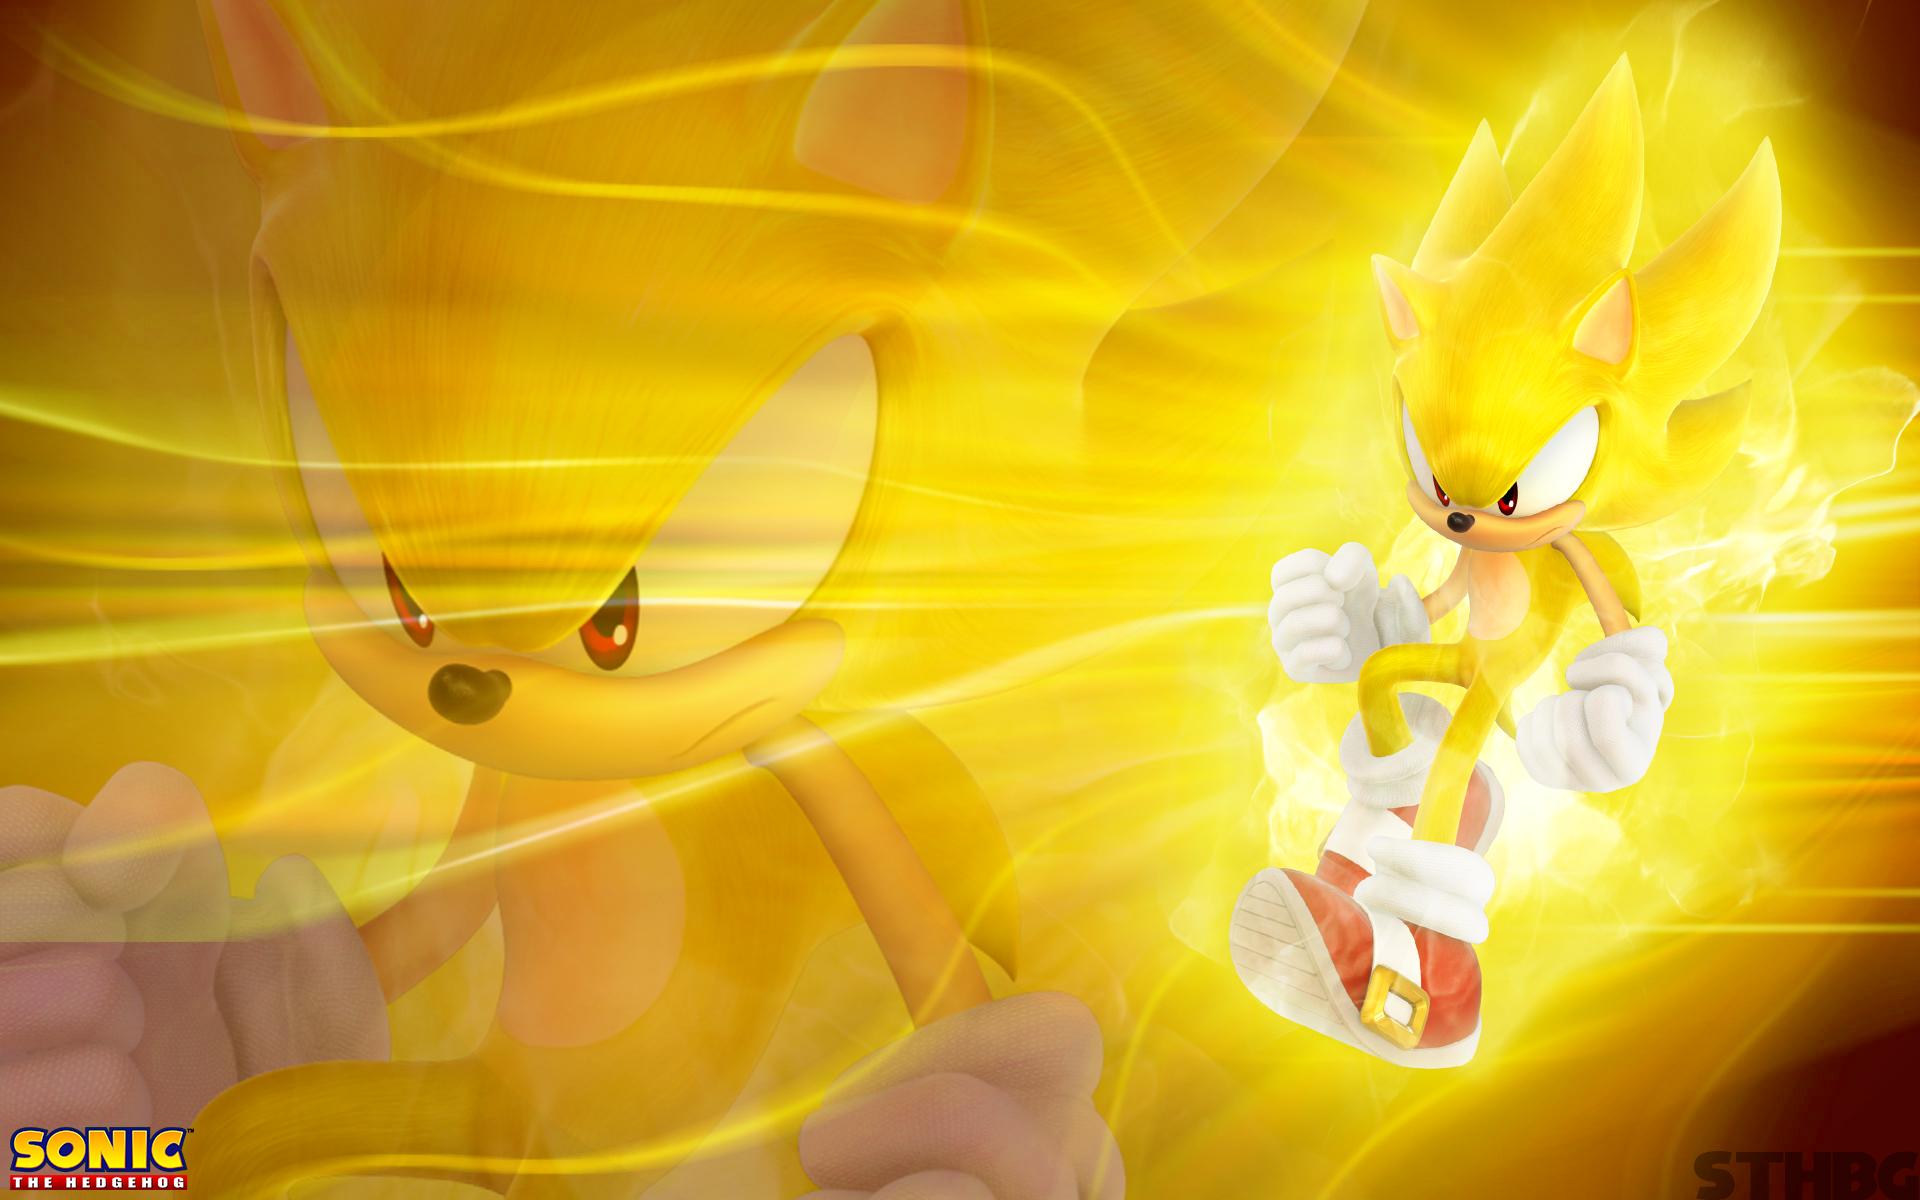 Super Sonic Wallpaper By Sonicthehedgehogbg On Deviantart